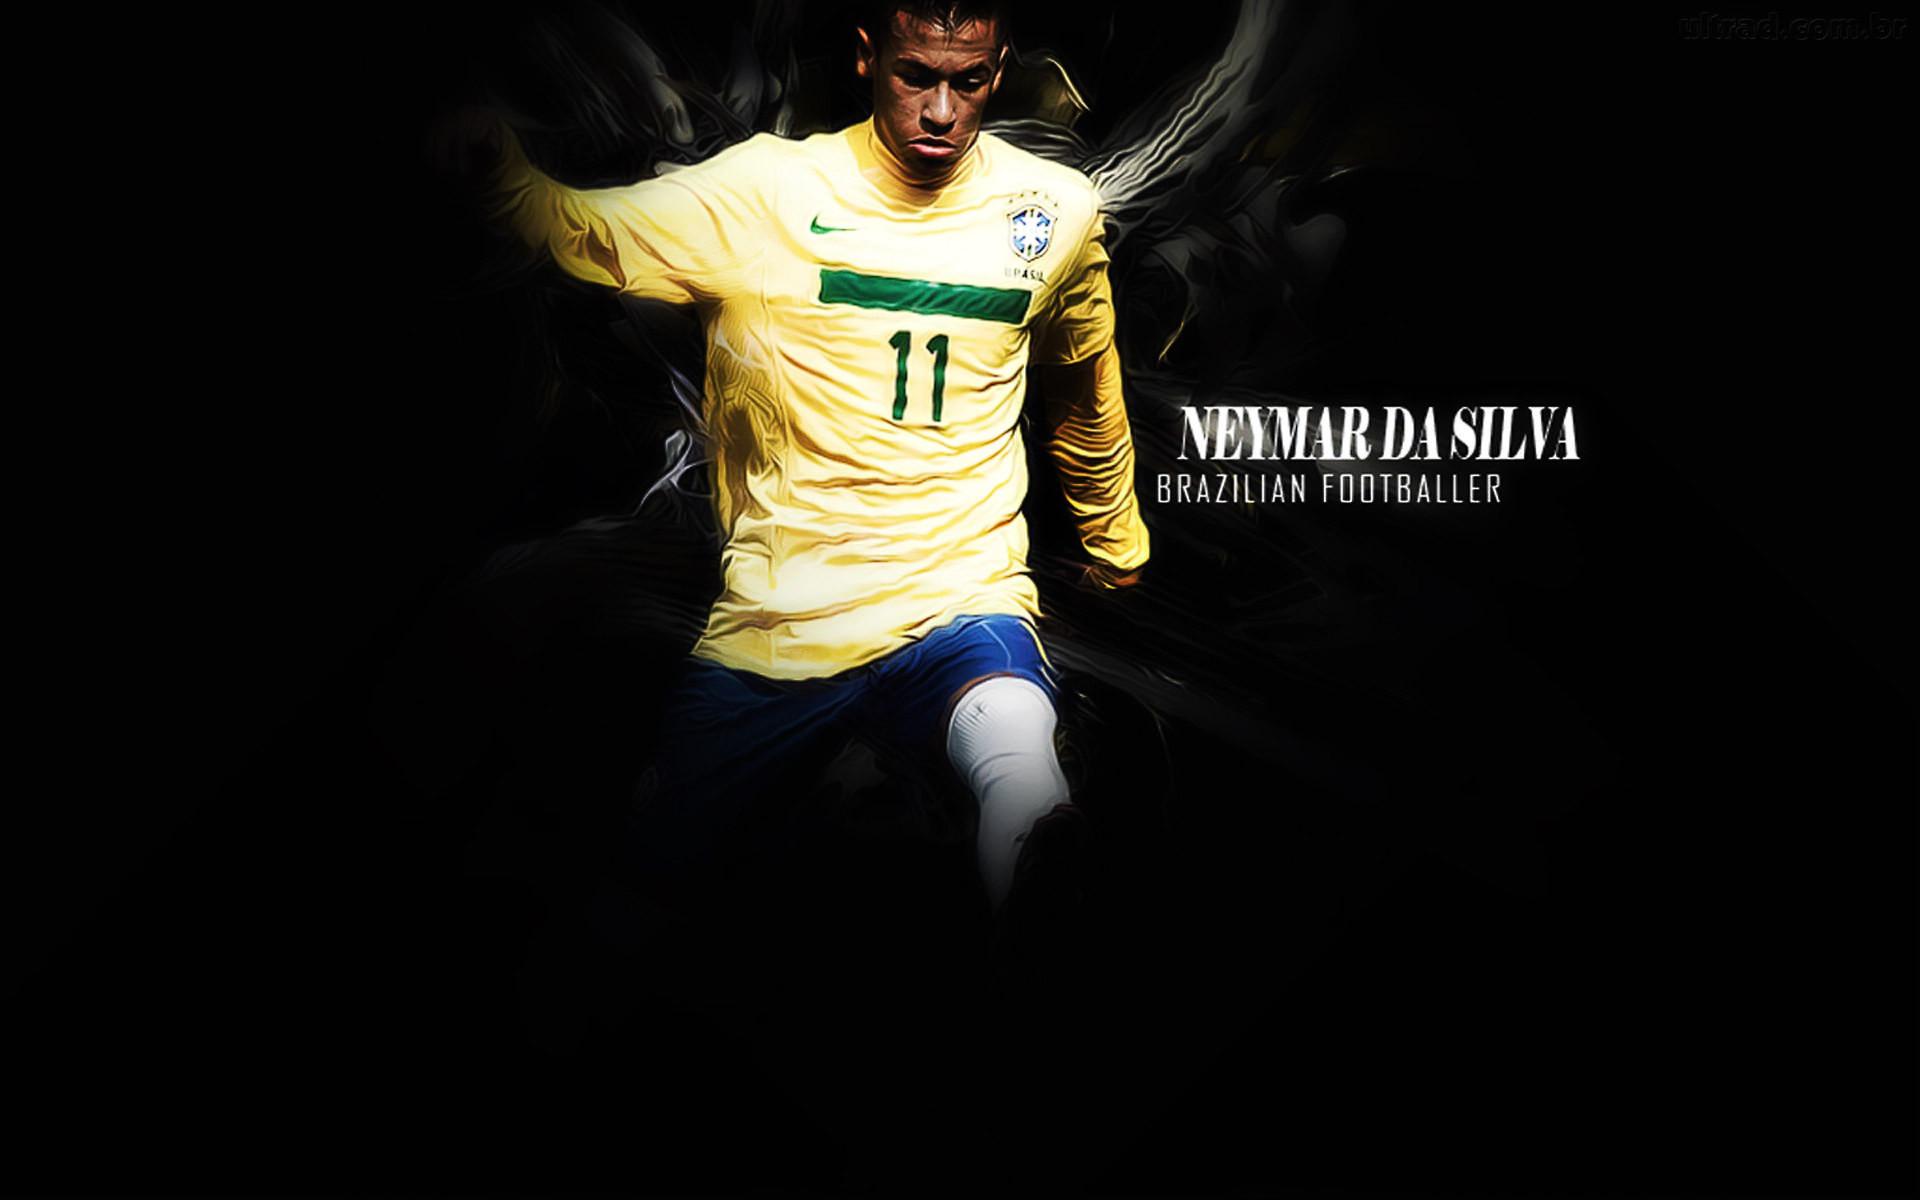 Neymar wallpaper: Brazil